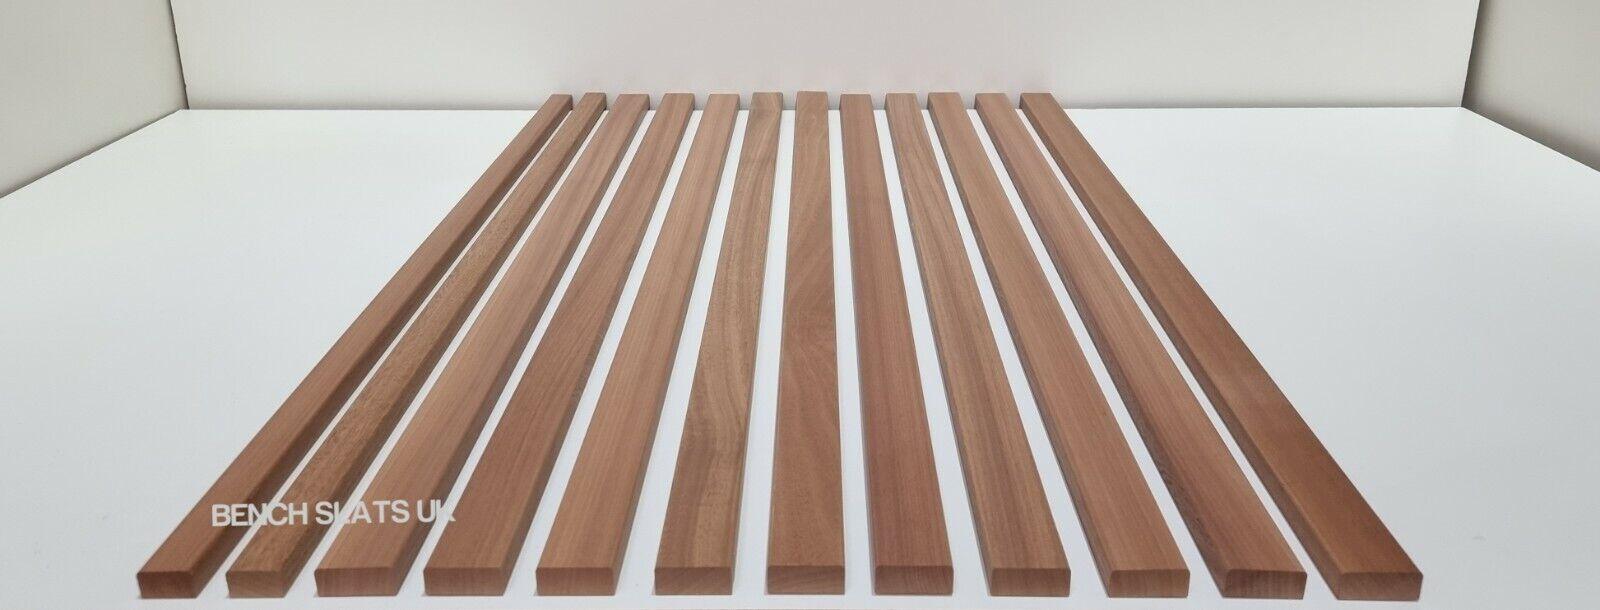 12 Solid Sapele Hardwood Garden Bench Slats Combinations 1220mm (4ft) 2 Seater